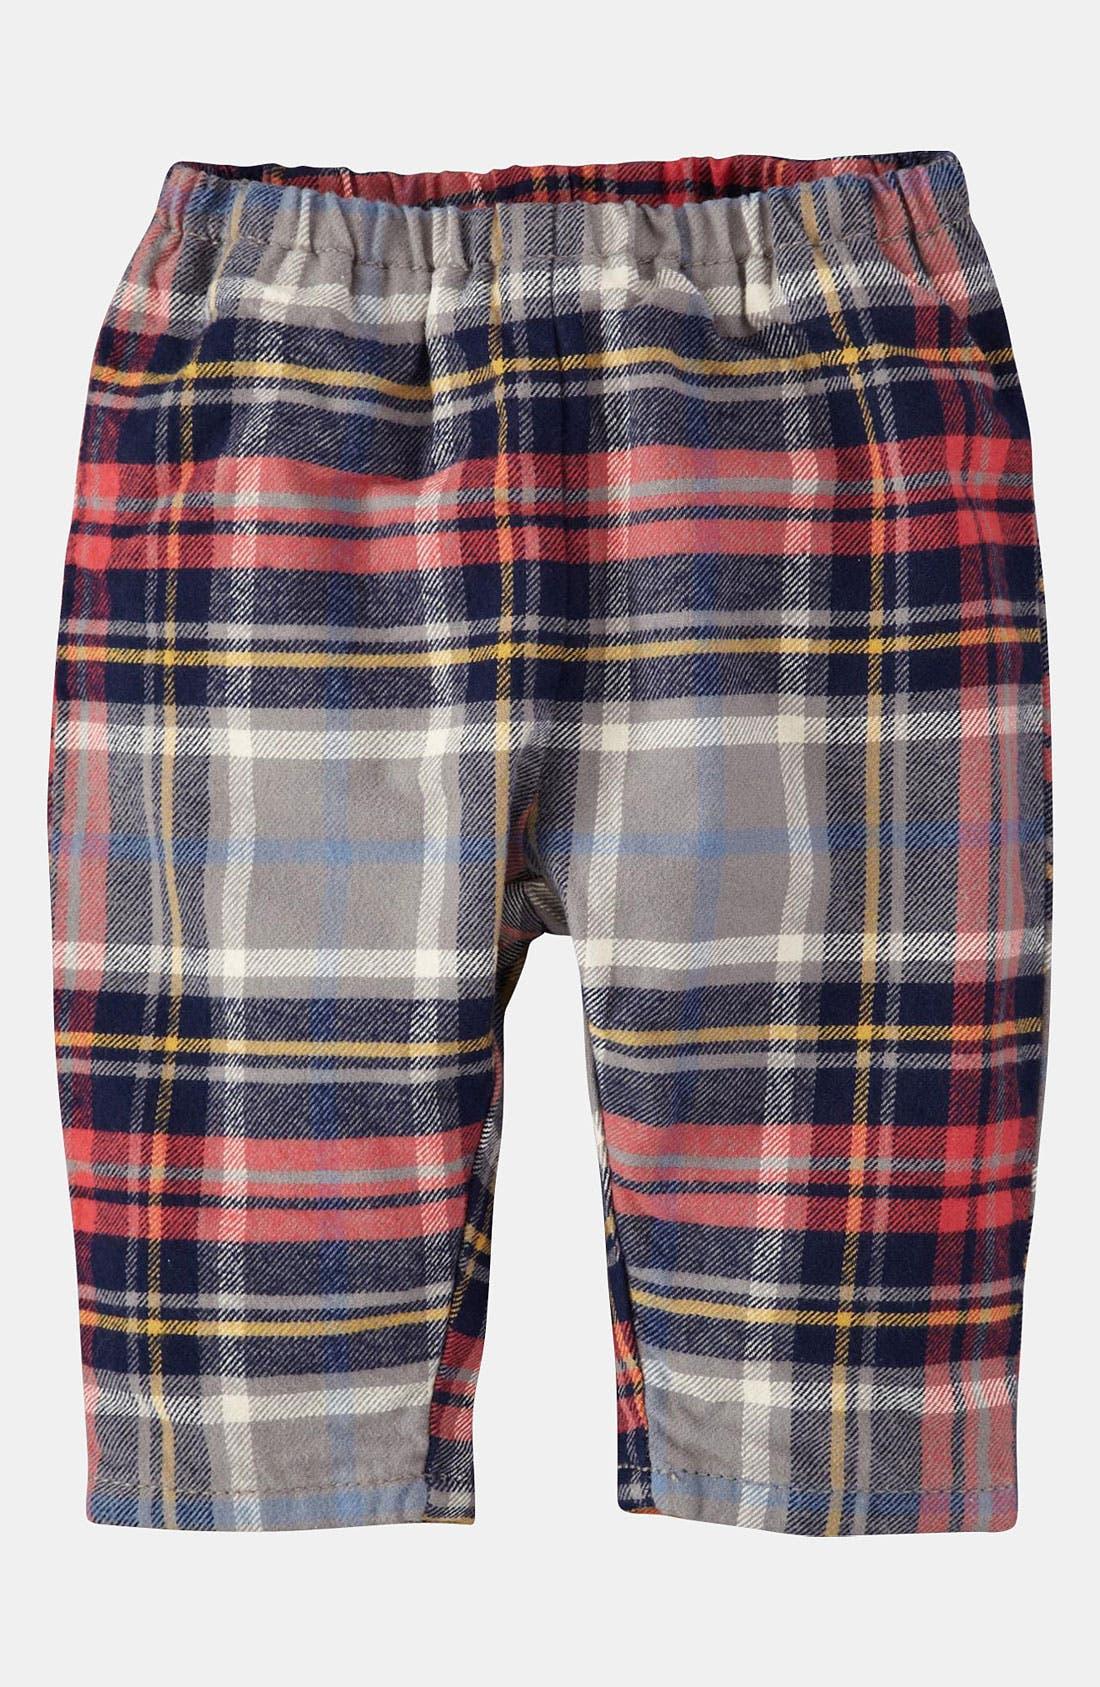 Alternate Image 1 Selected - Mini Boden Lined Pants (Infant)